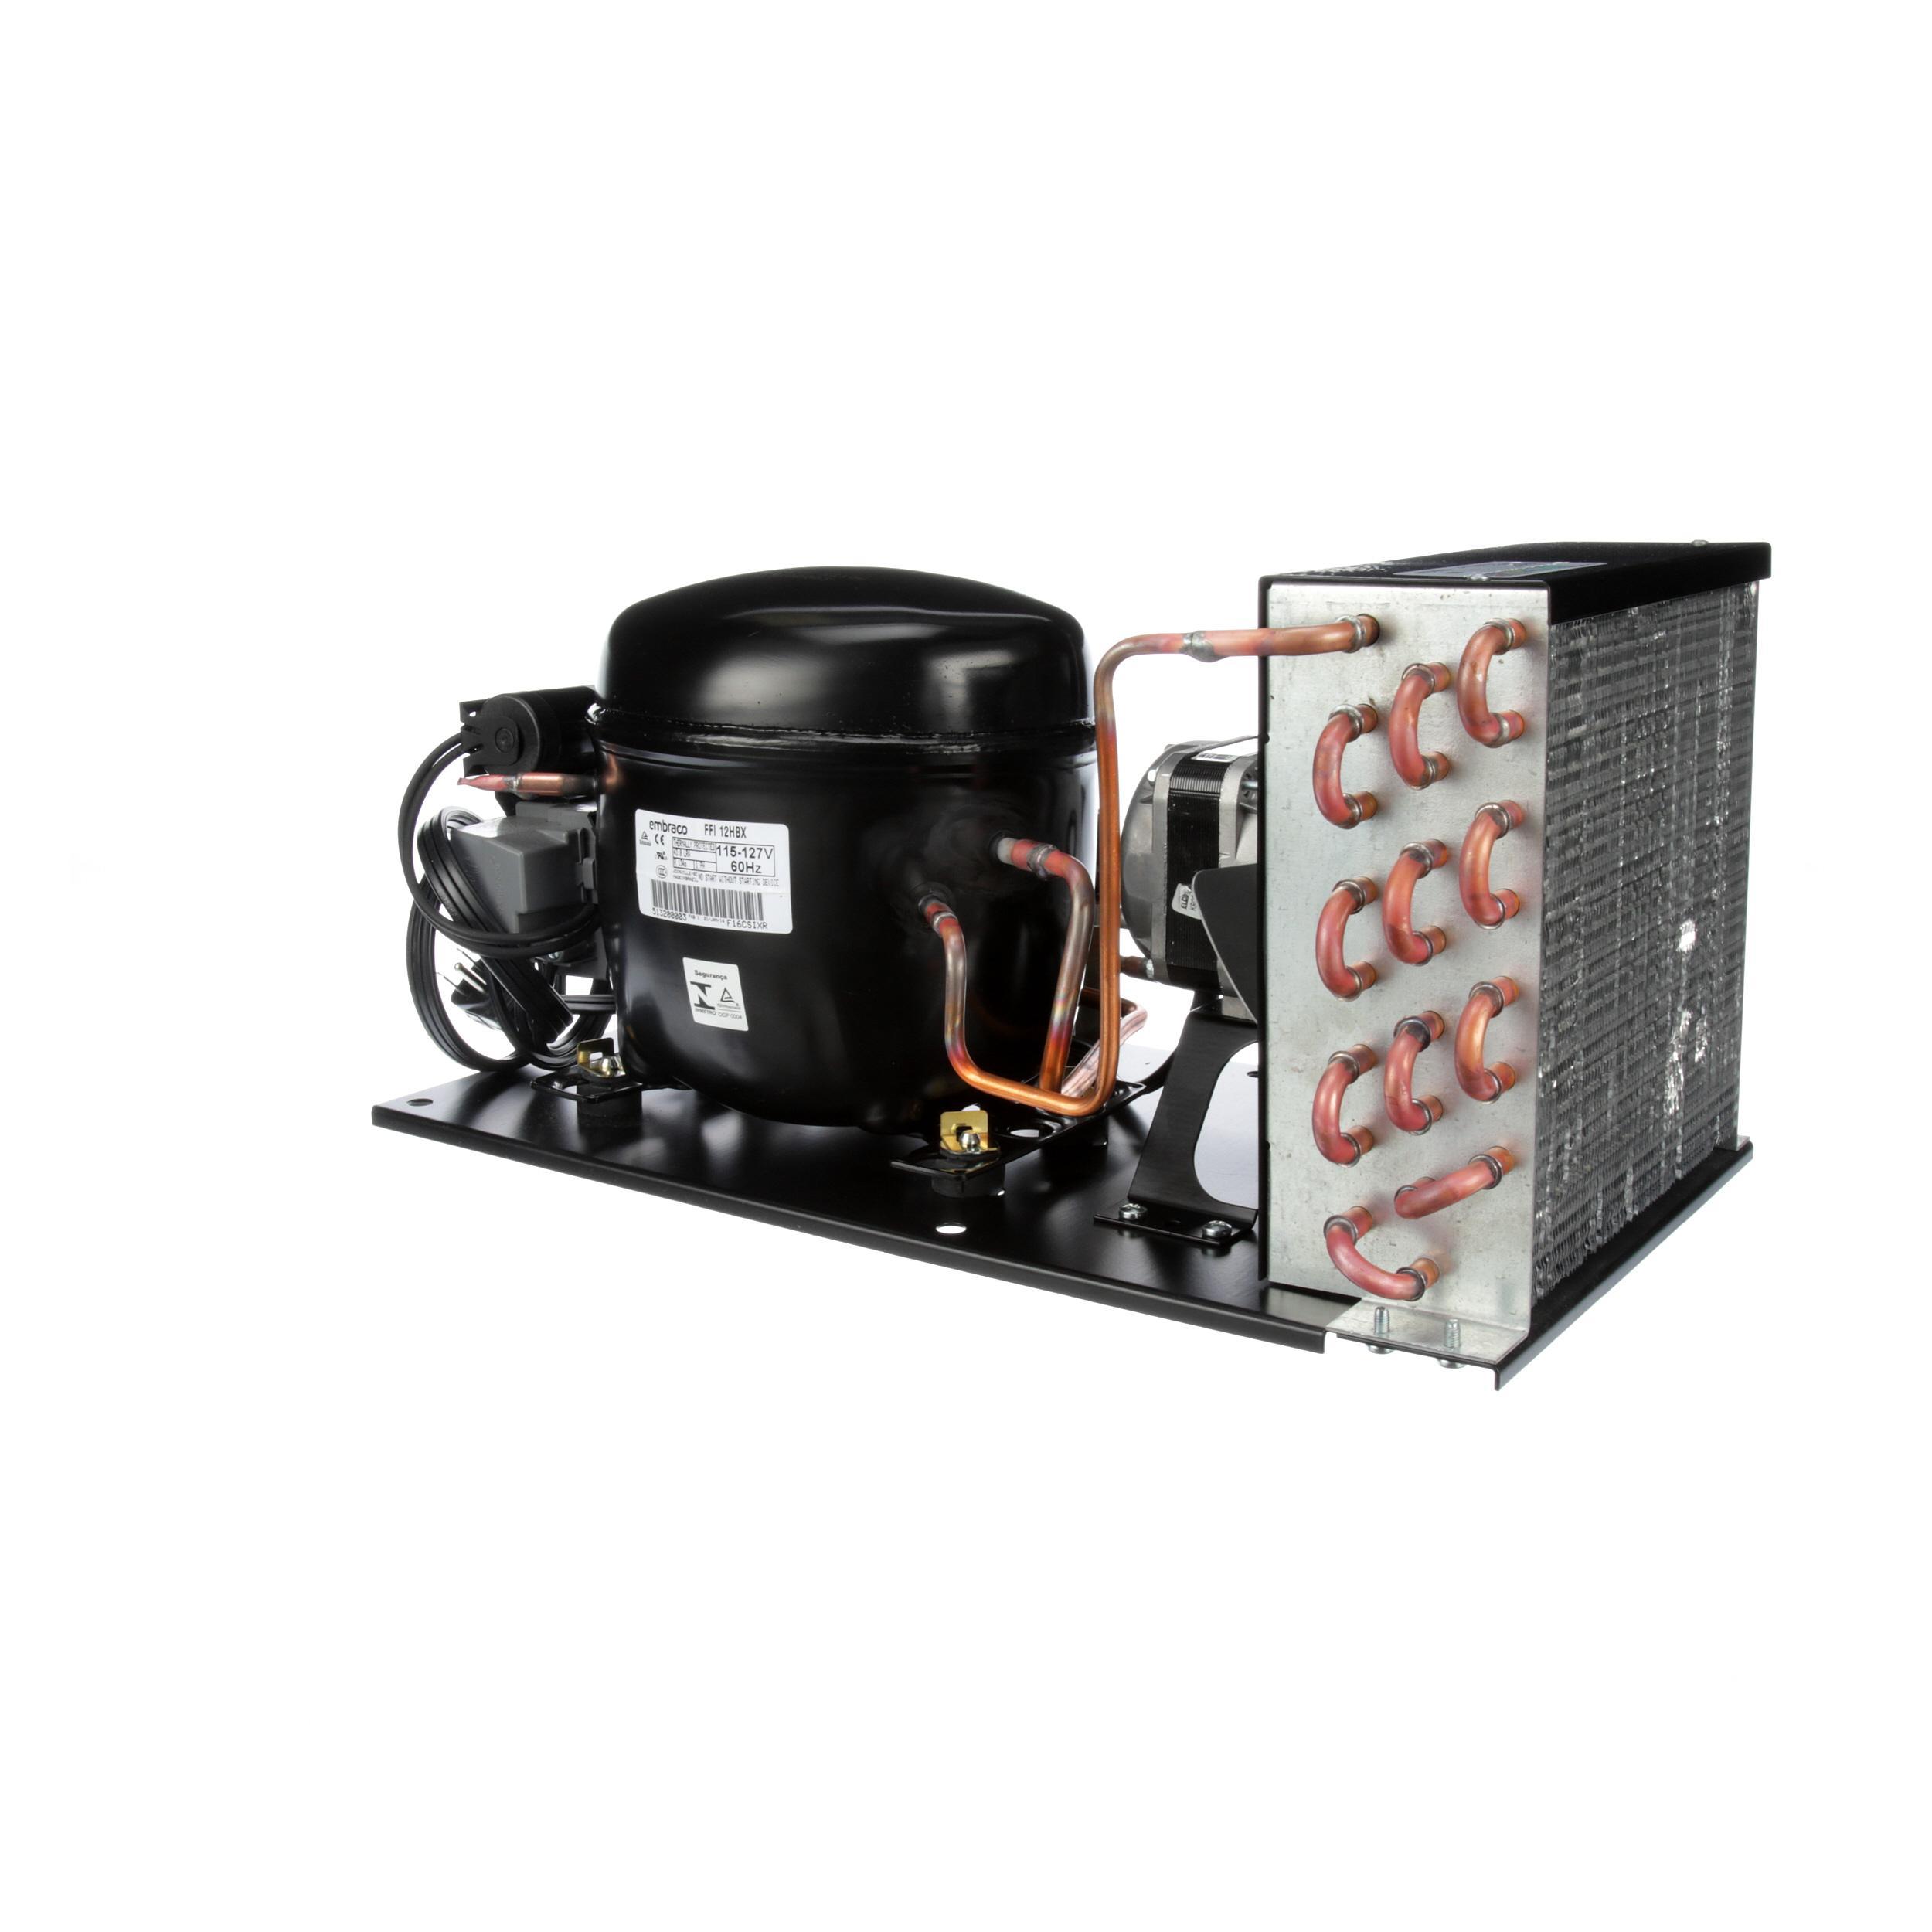 PERLICK CONDENSING UNIT 1/3 HP 115V